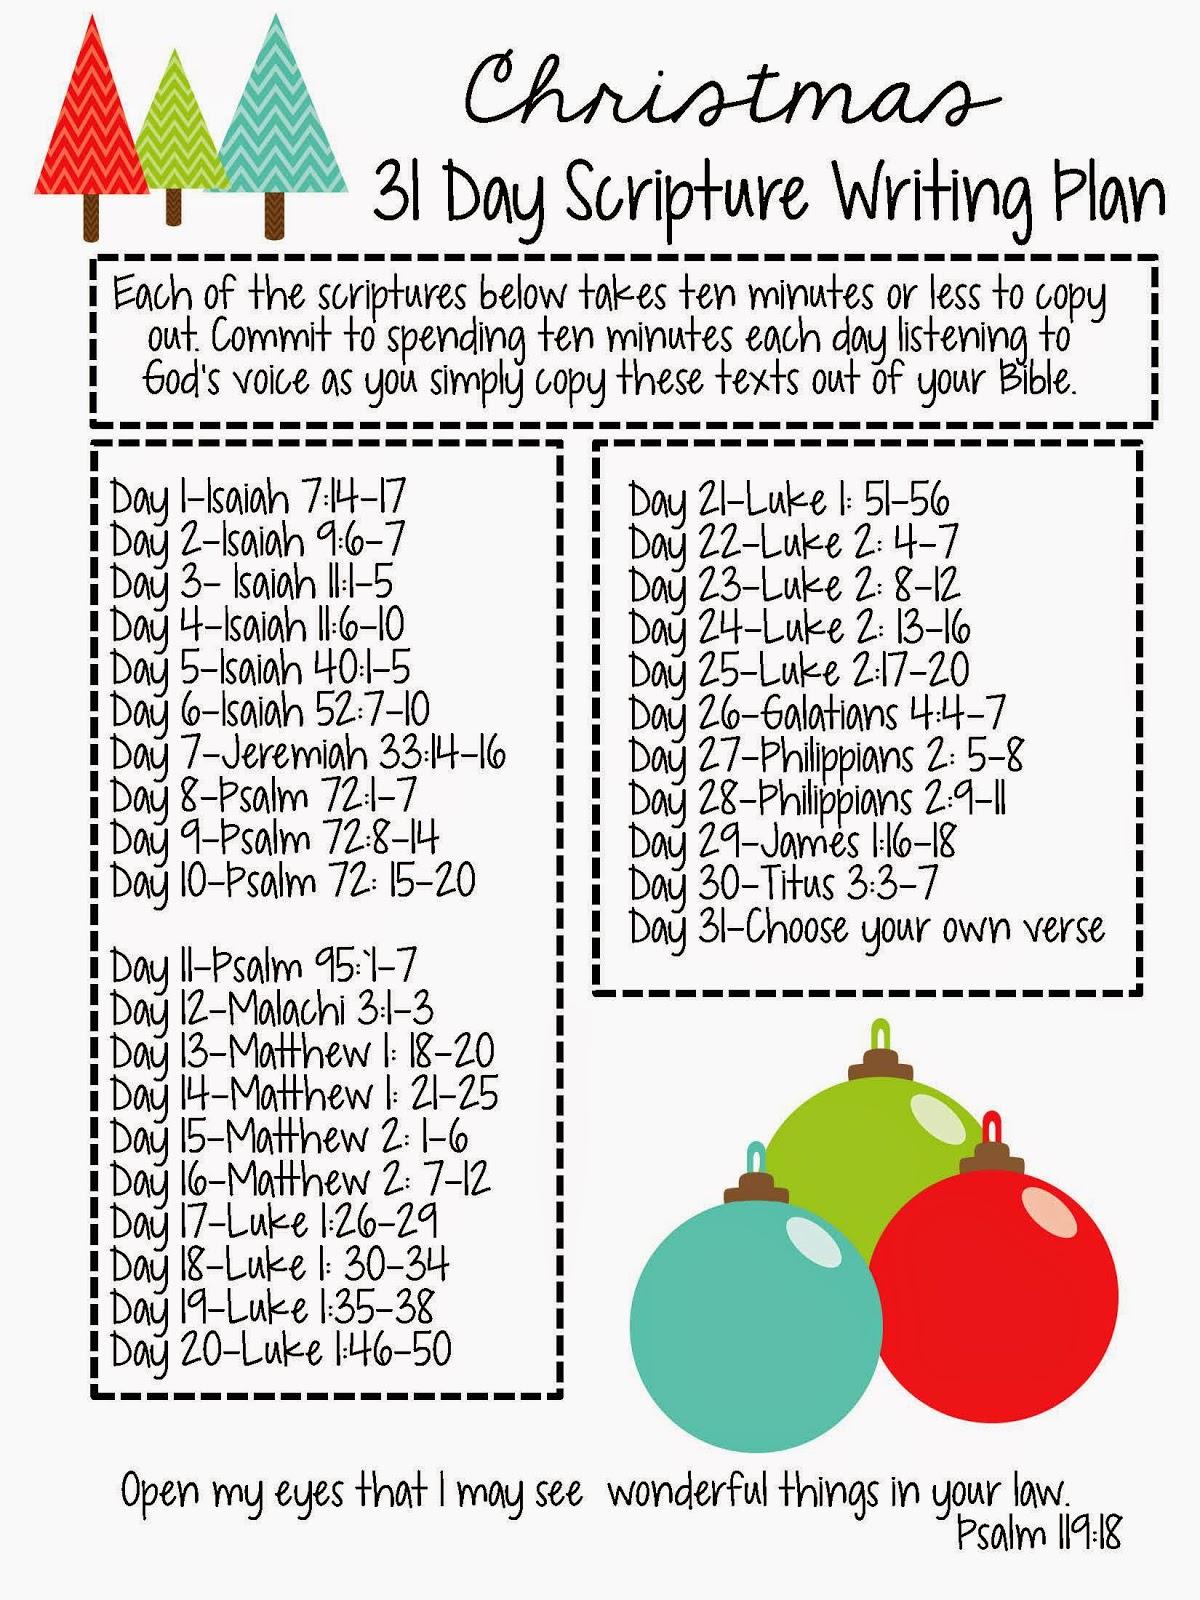 Christmas Scriptures.Sweet Blessings Christmas Scripture Writing Plan